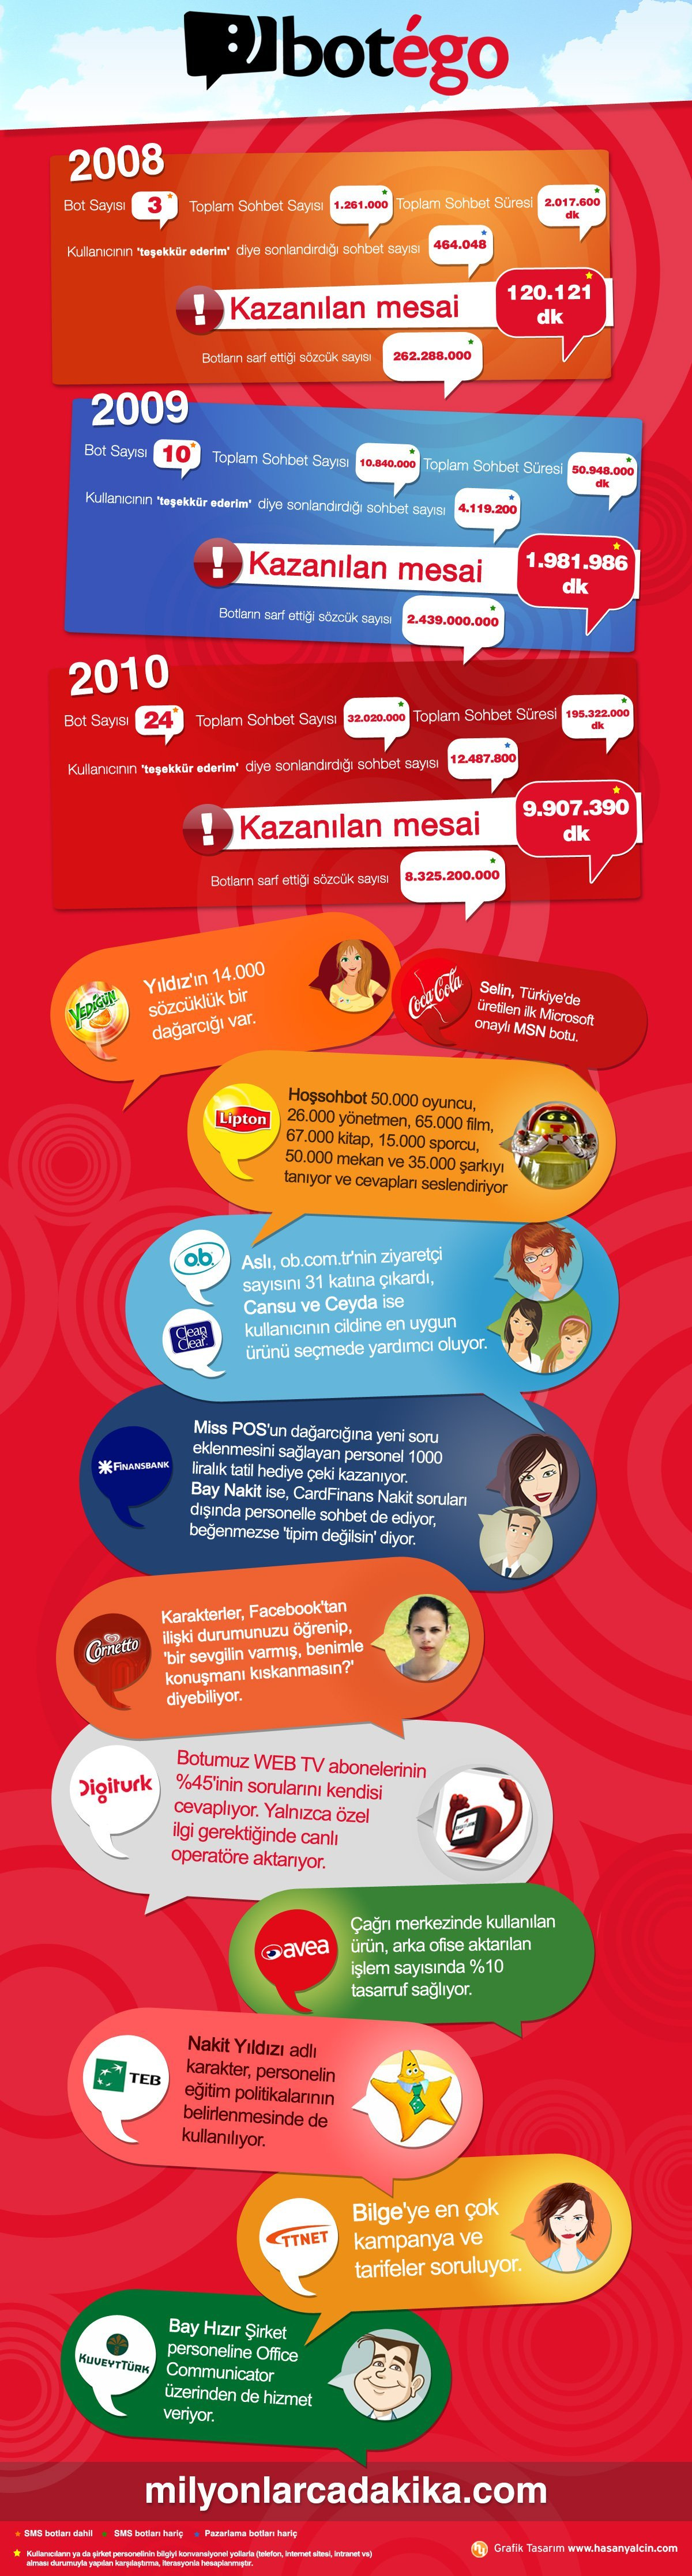 Botego Infografik